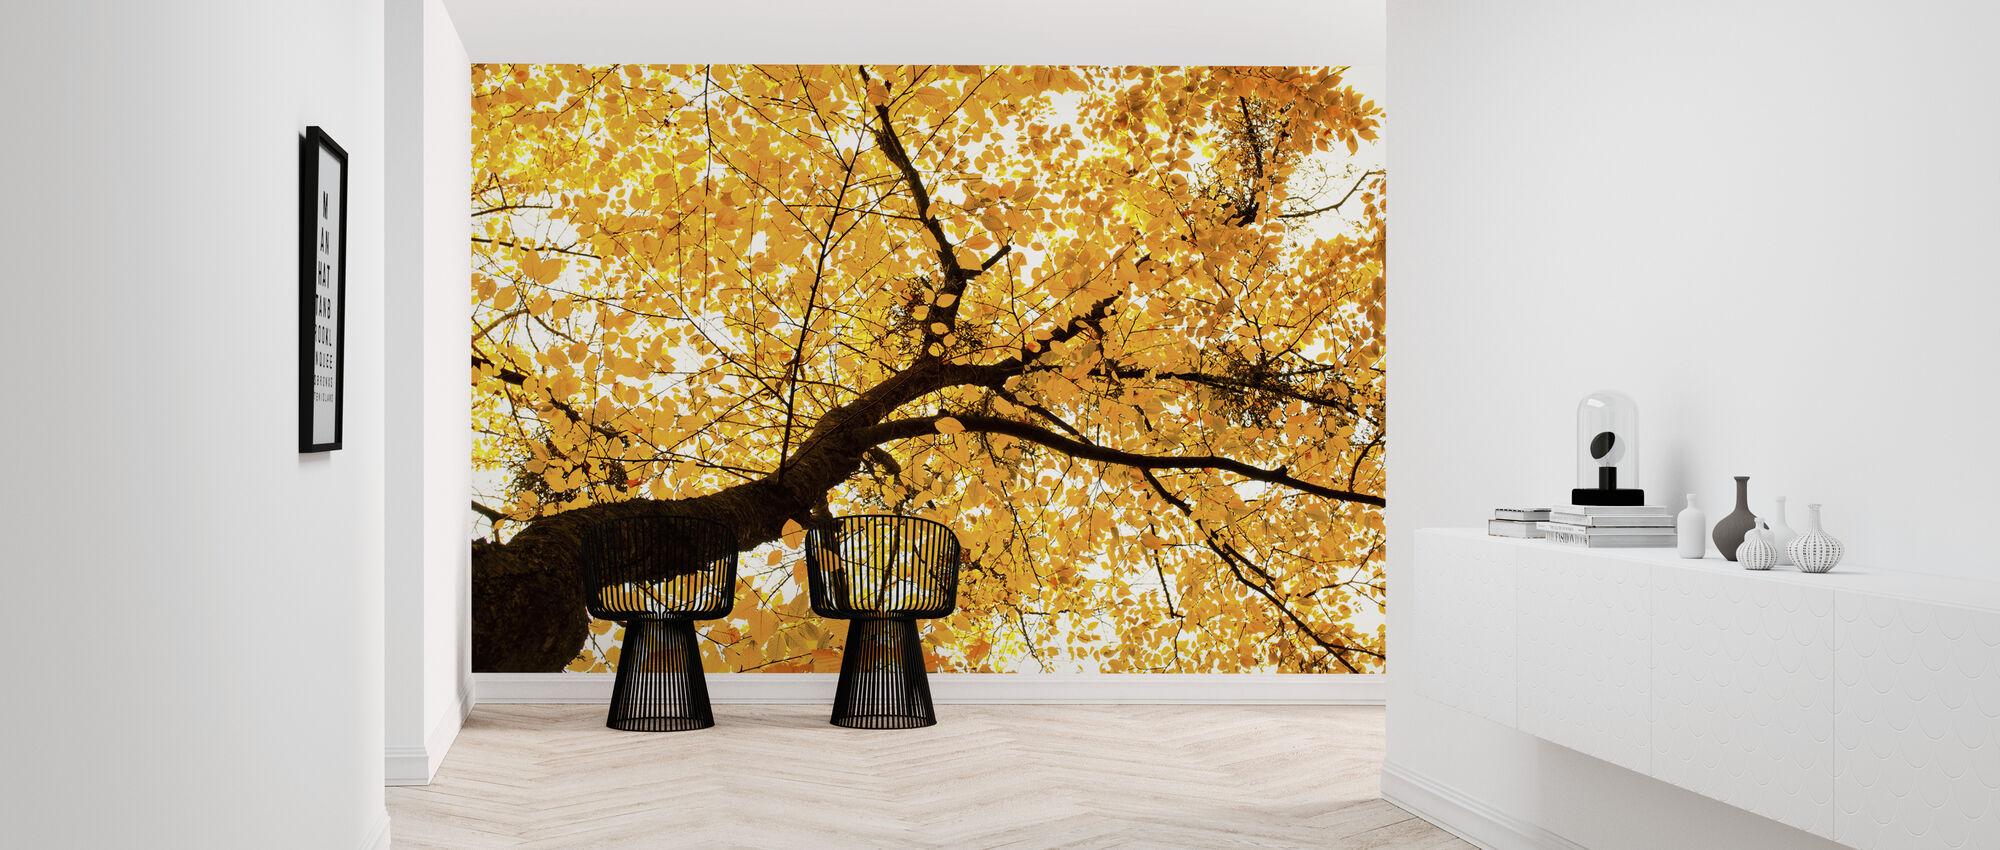 Golden Leaves - Wallpaper - Hallway